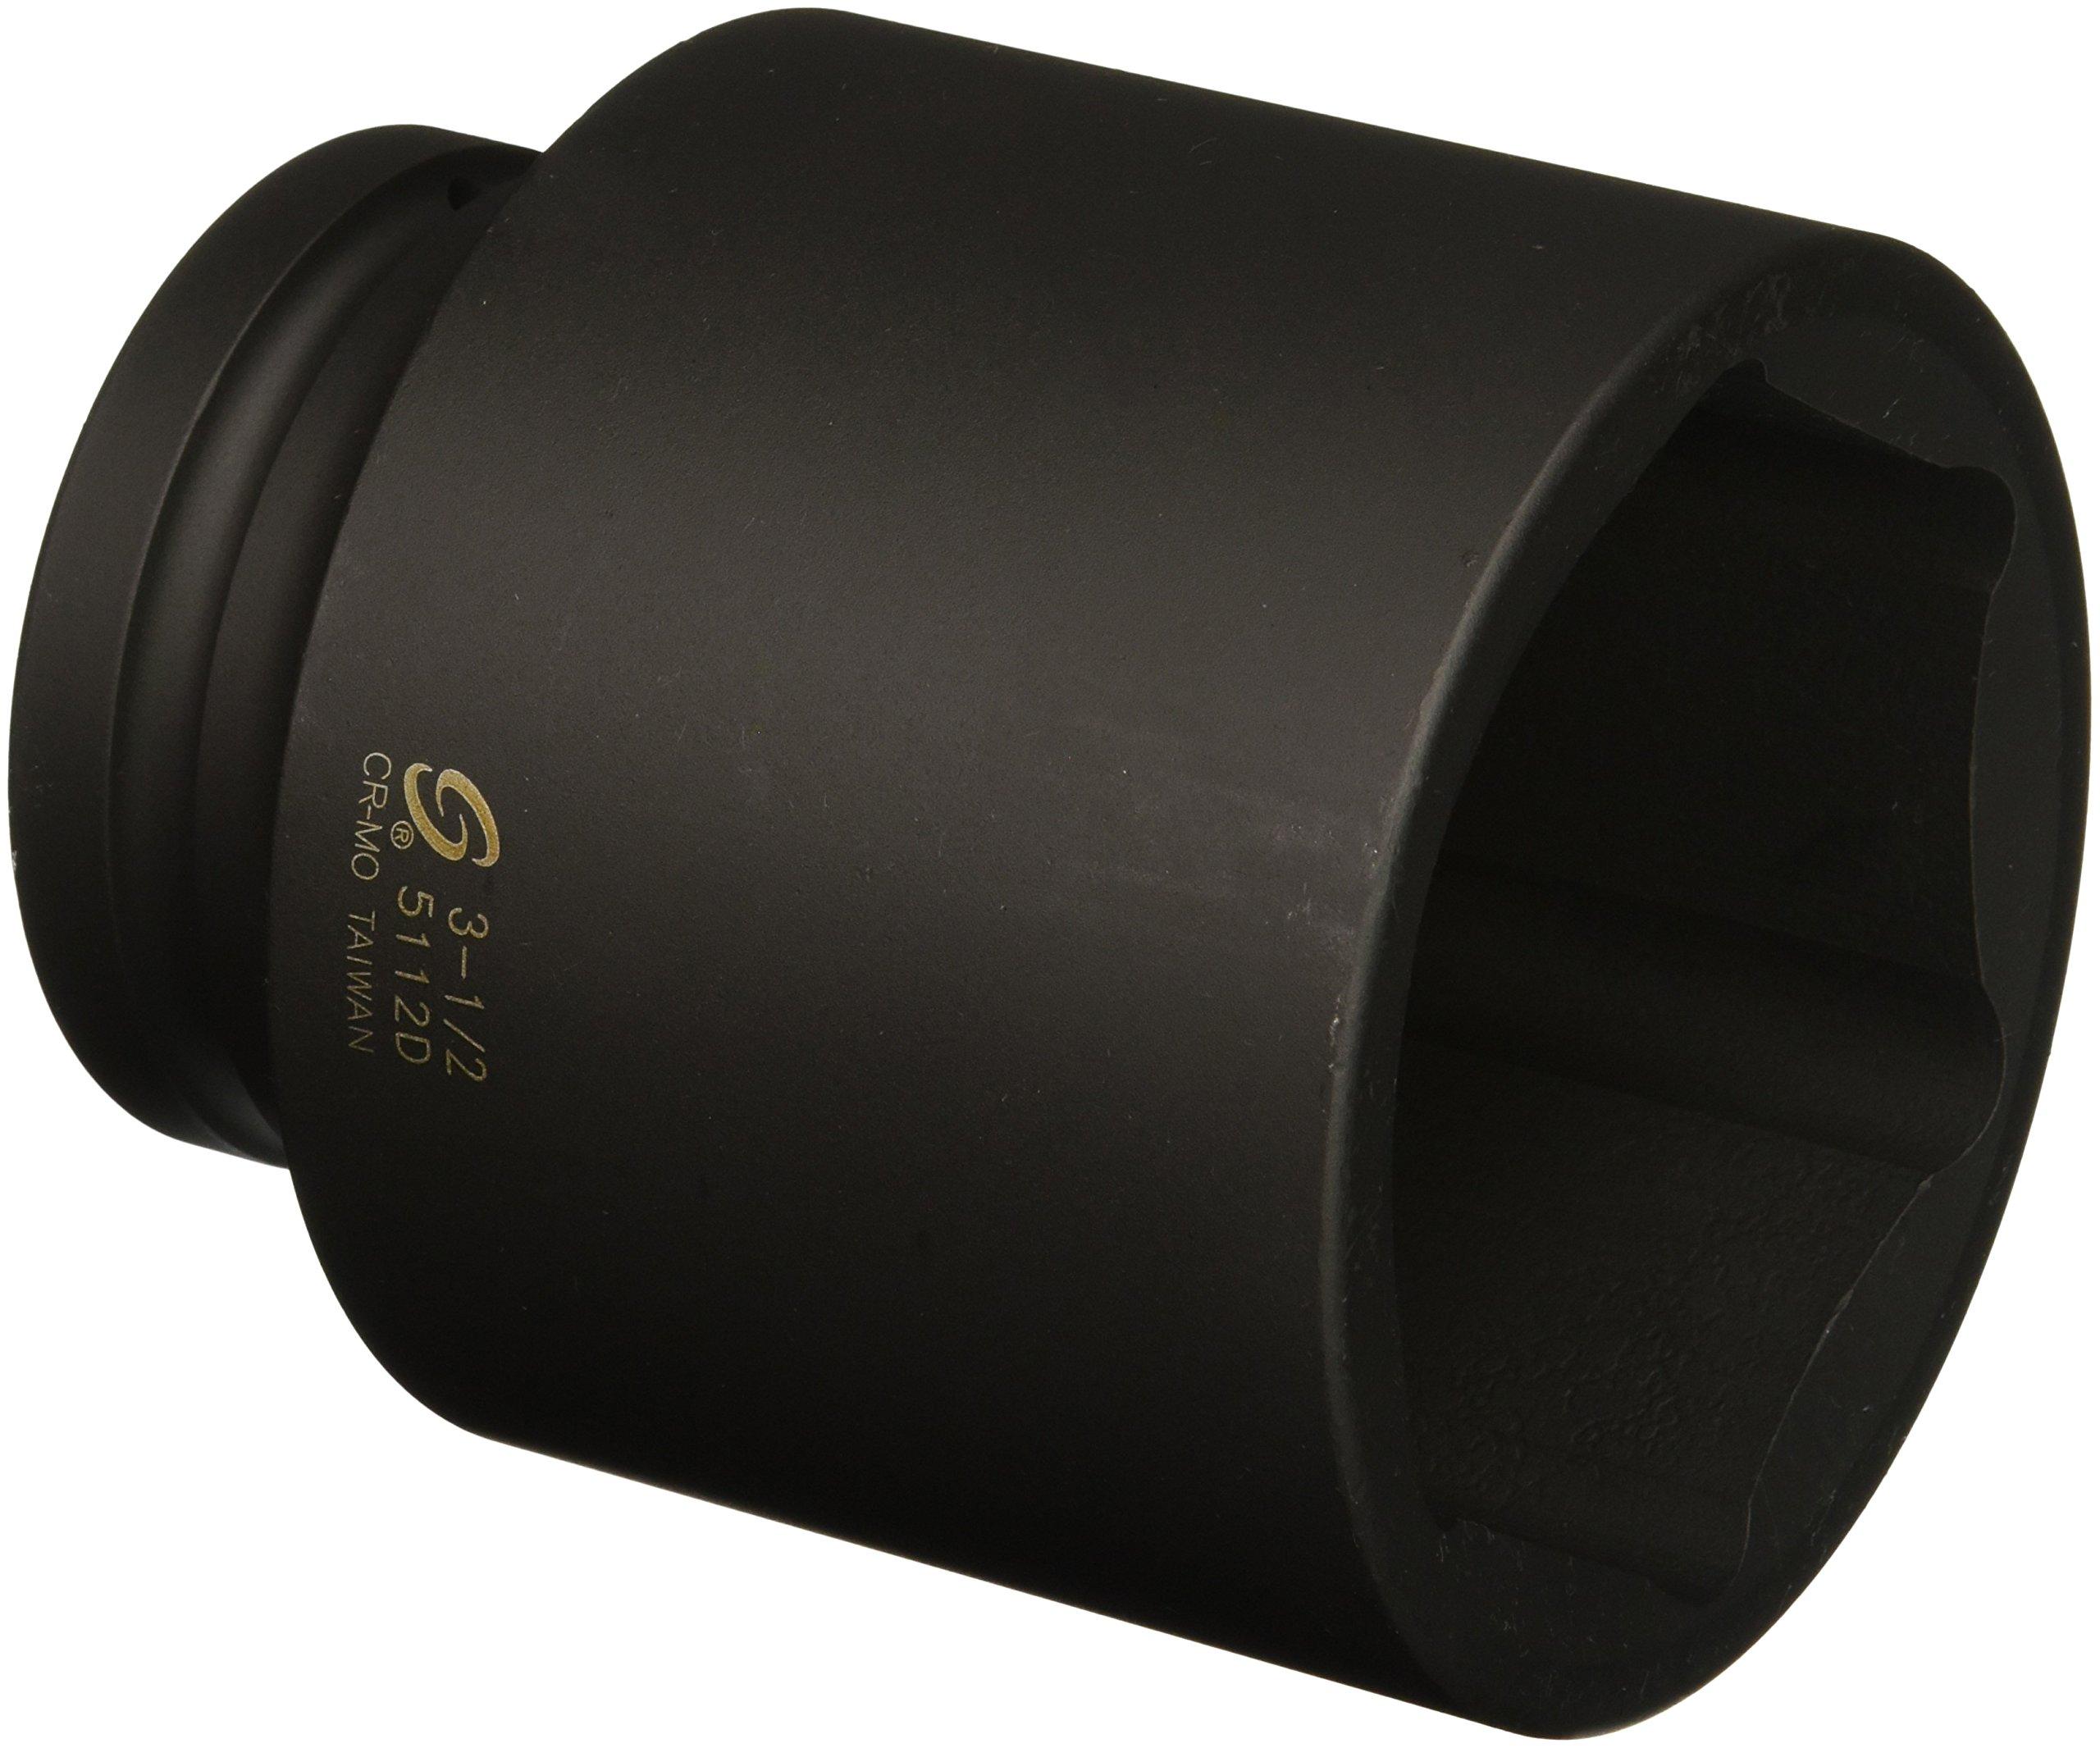 Sunex 5112D 1'' Drive Deep Impact Socket 3-1/2''